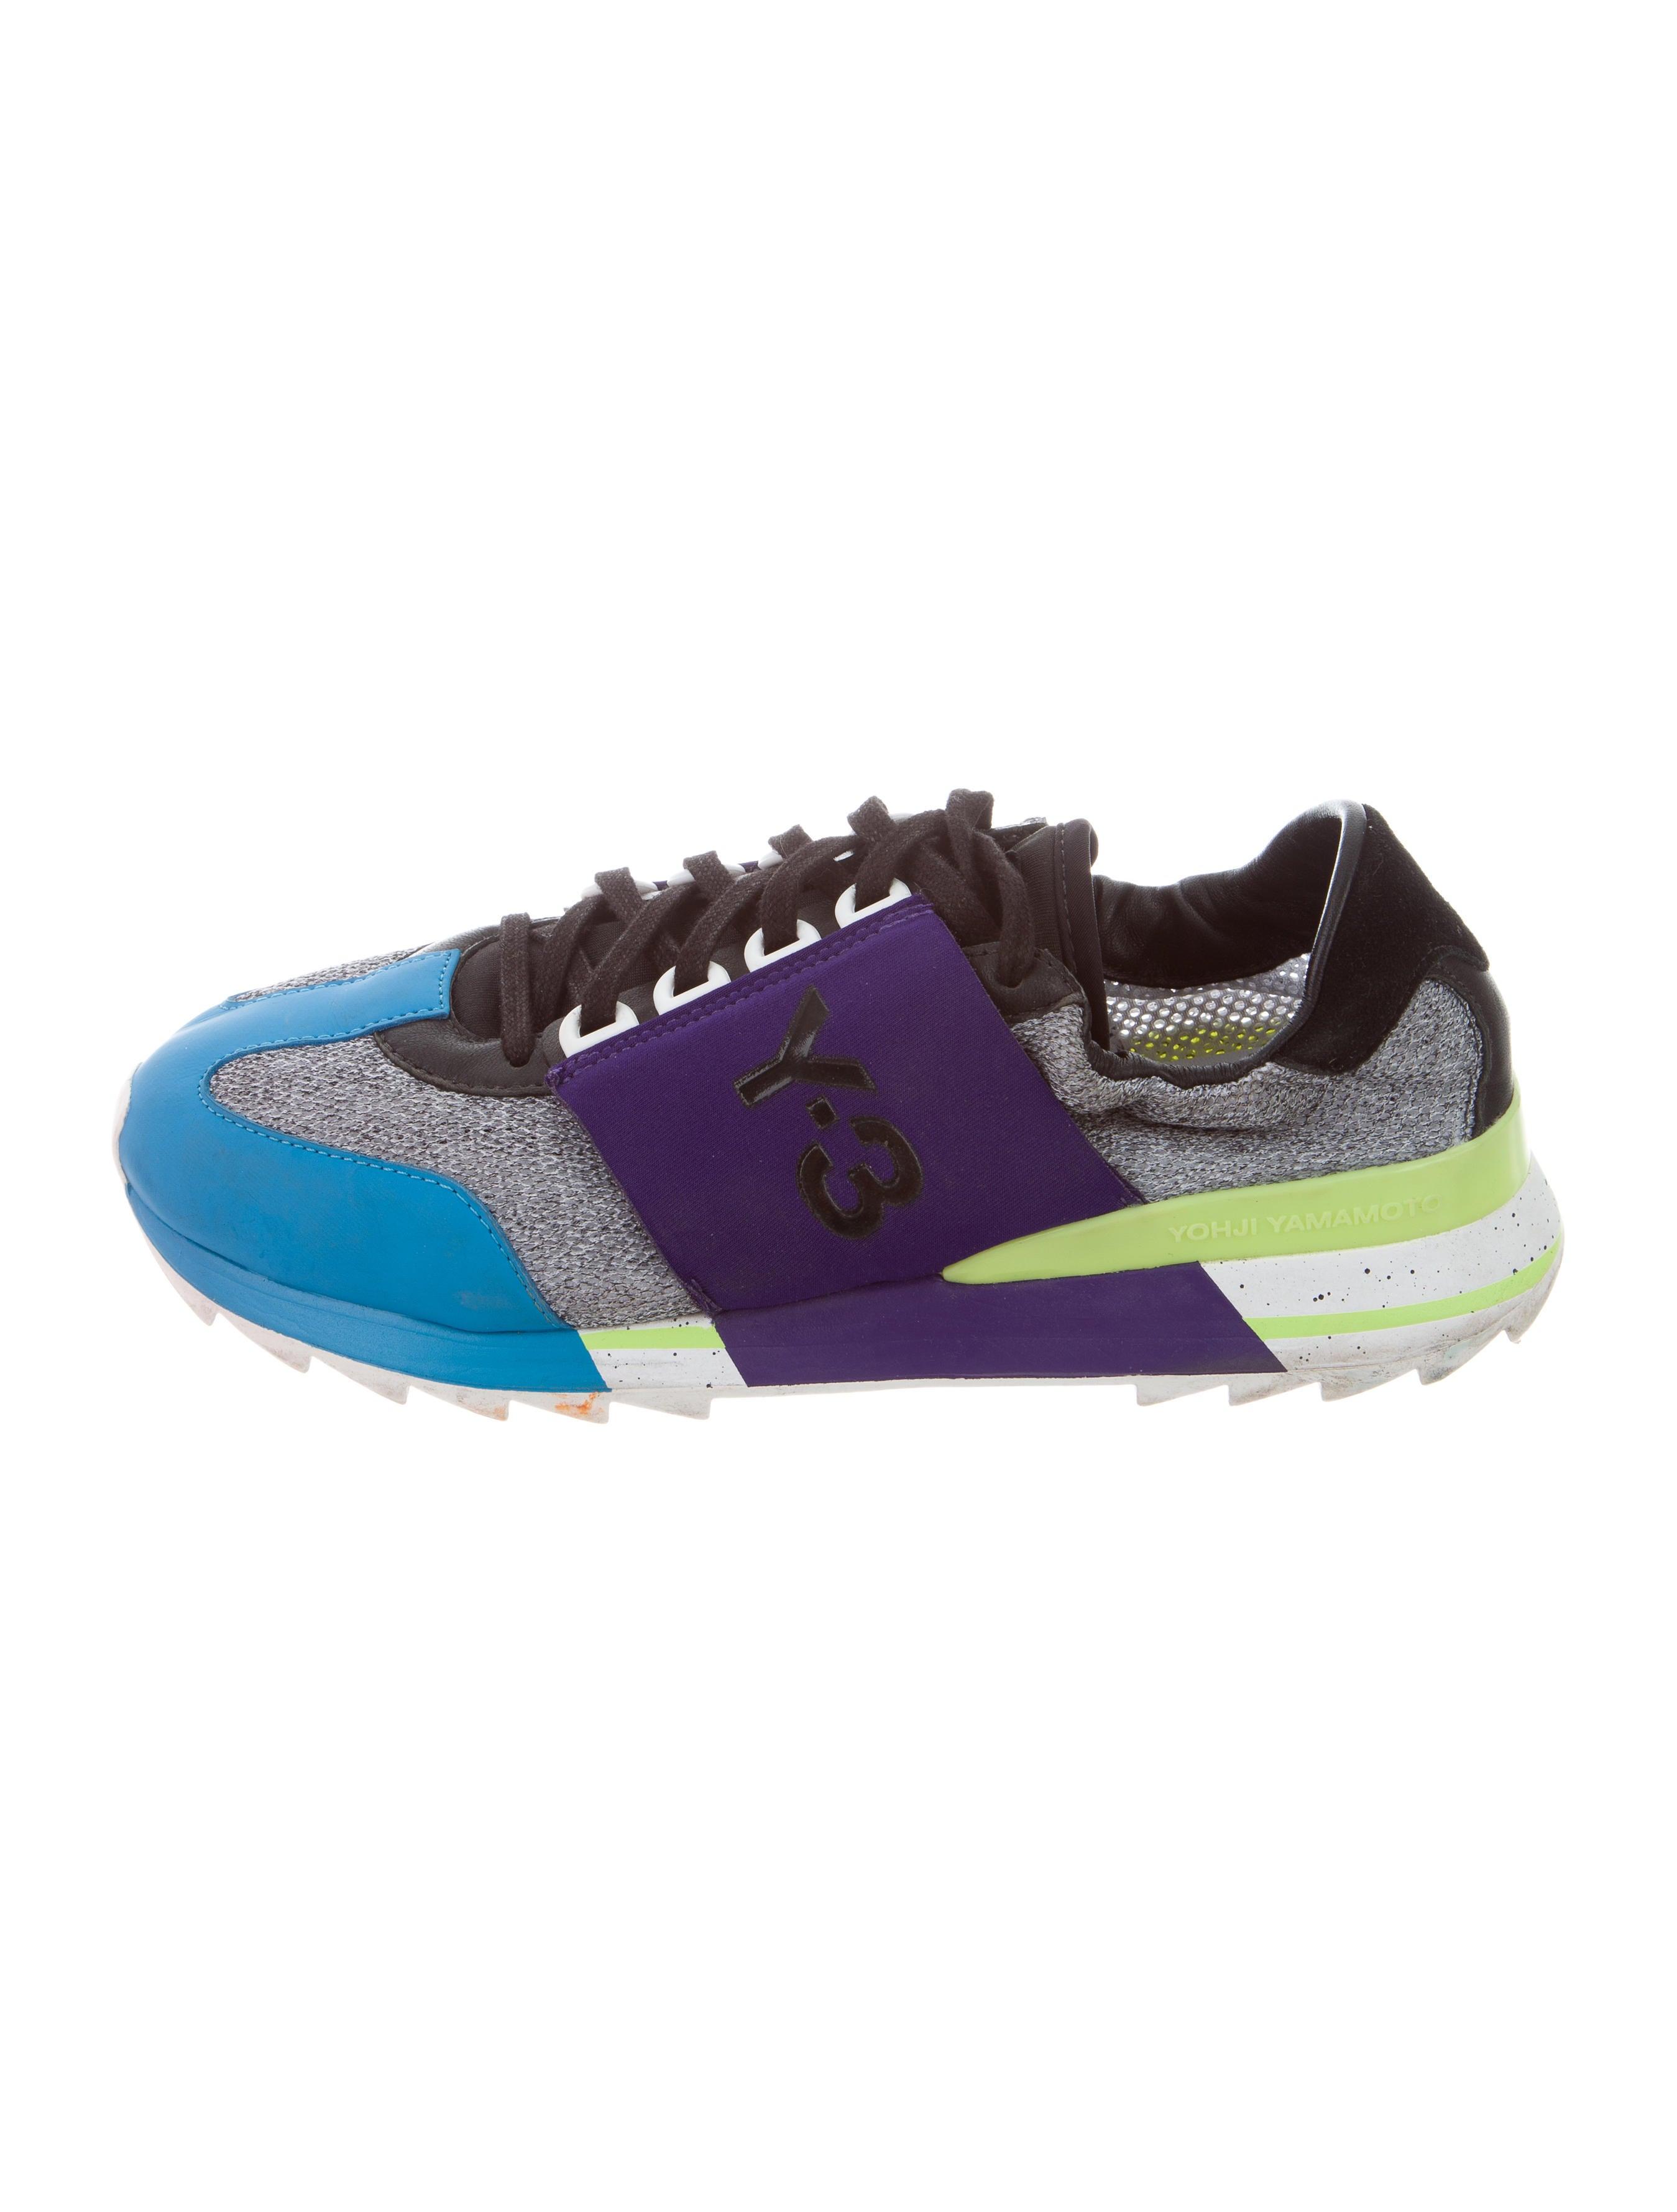 8d22e593ea0e9 Y-3 x Adidas Rhita Sport Sneakers - Shoes - WY3AD21028